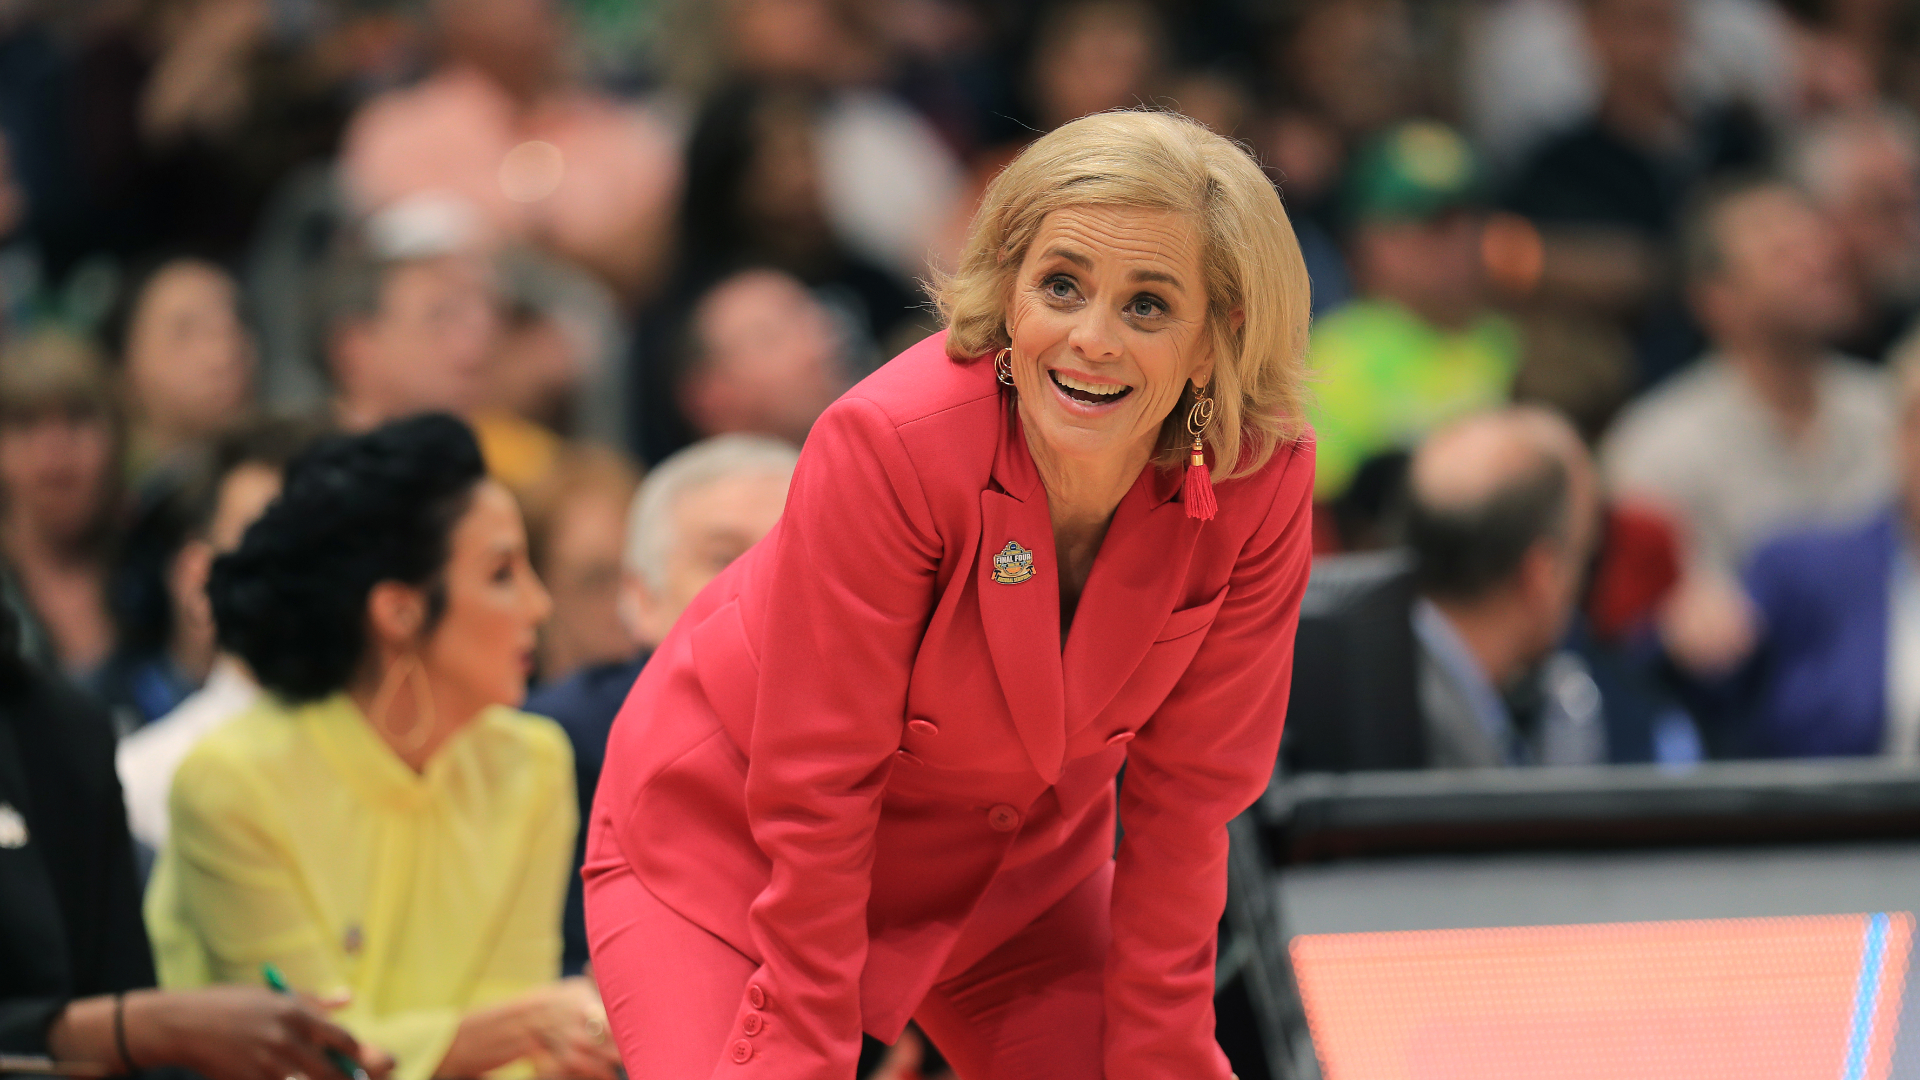 LSU hires Baylor's Kim Mulkey, three-time NCAA champion, as new women's basketball coach